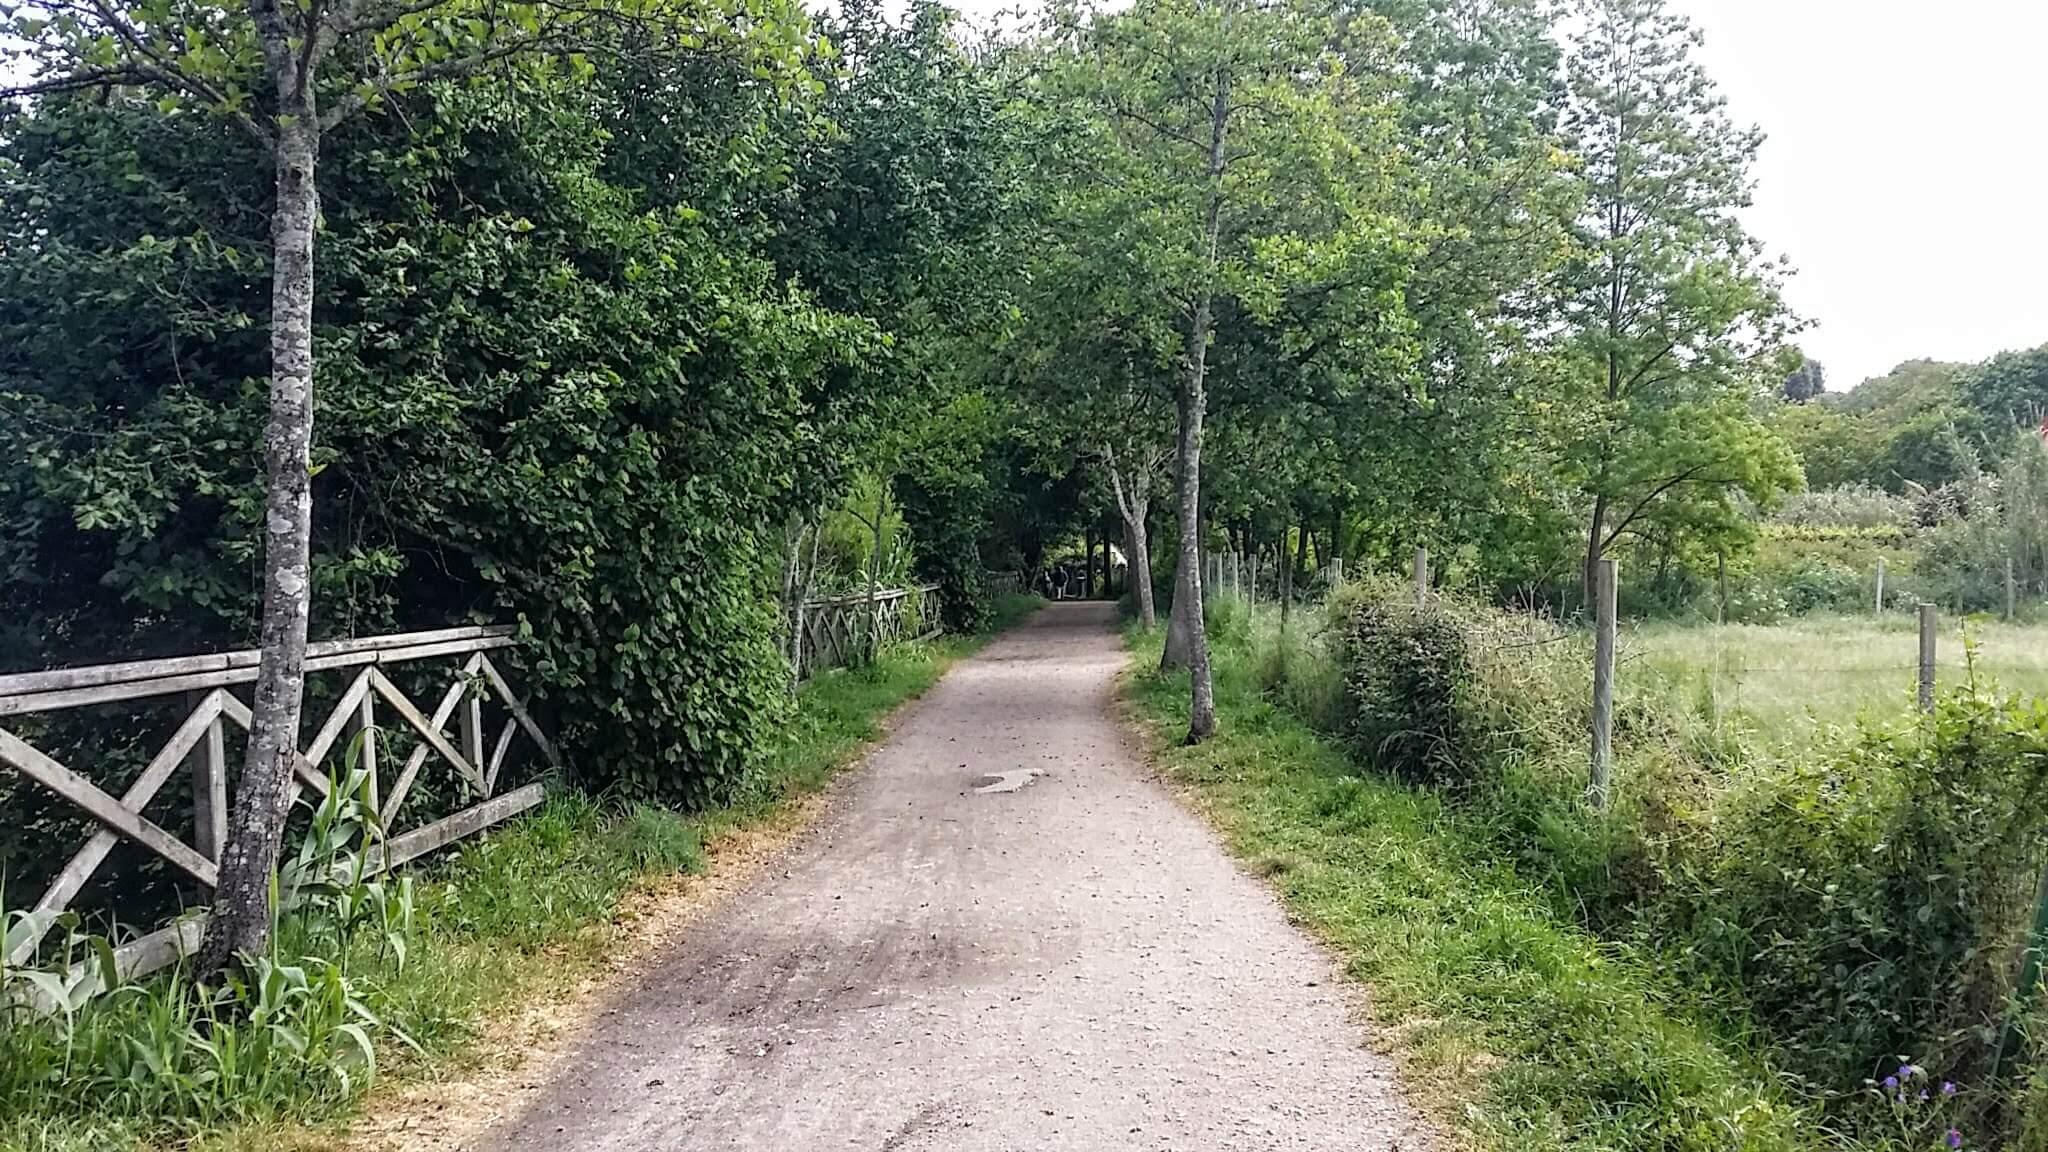 Senda do Lagares Trail System by the Lagares River, Vigo, Spain on day twenty-one of Portuguese Way